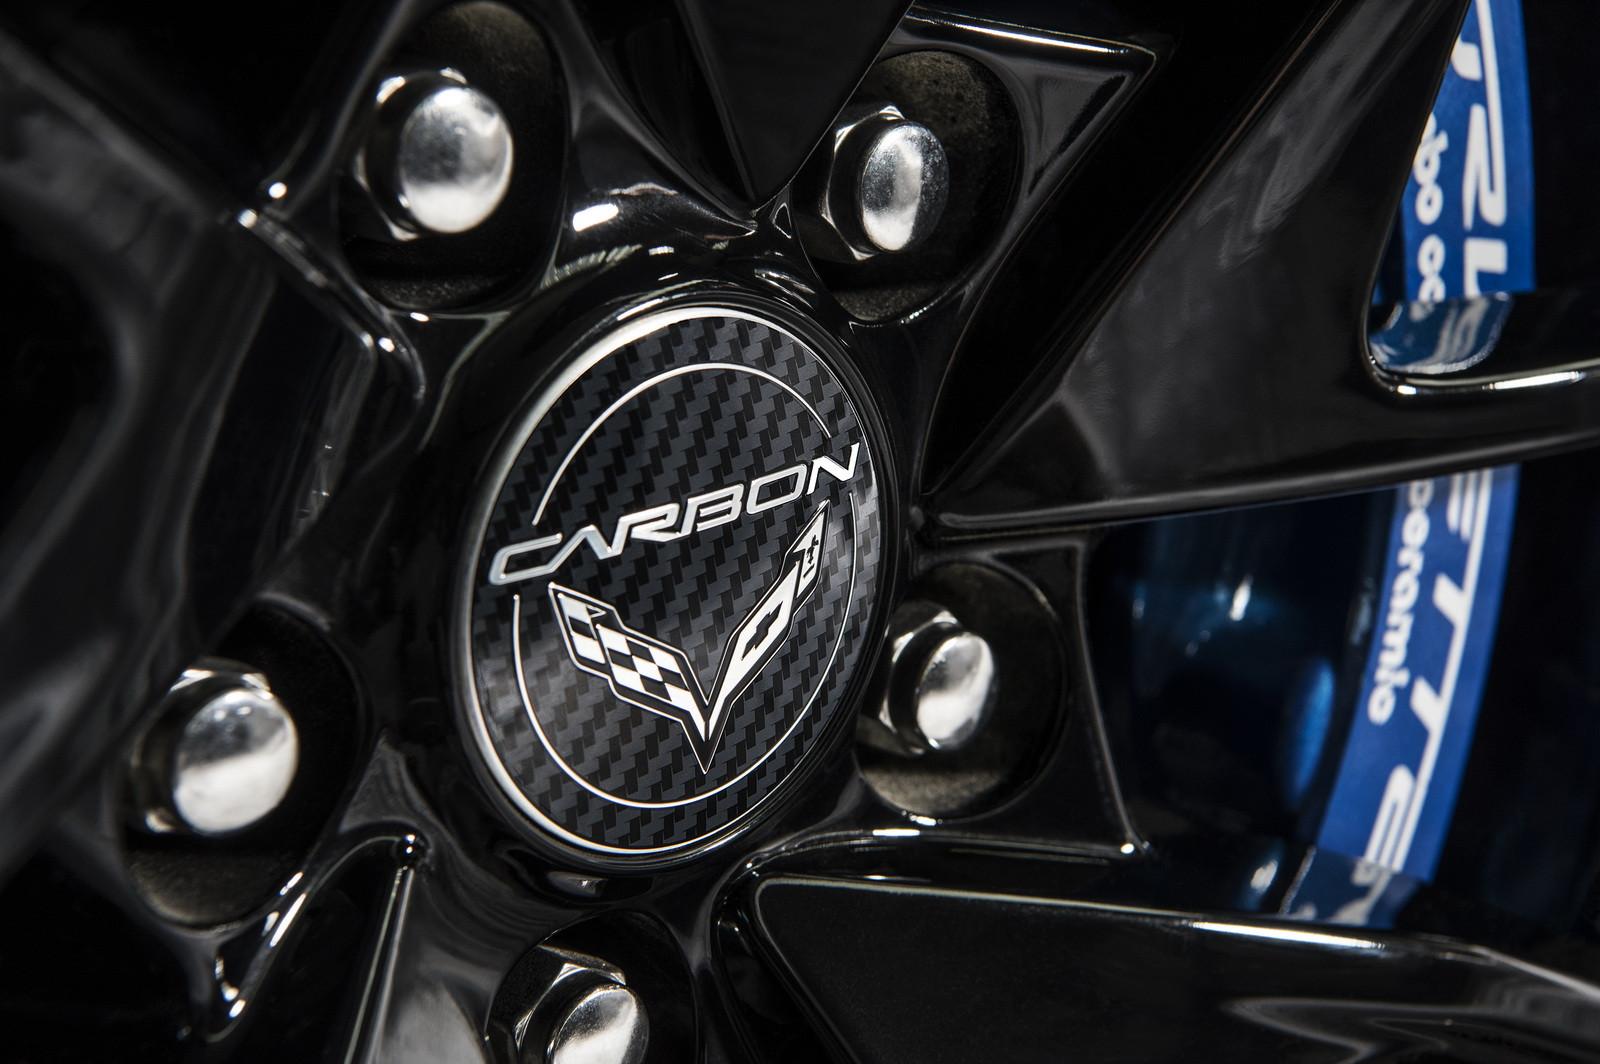 Шевроле отмечает 65-летие Corvette спецверсией за140 тыс. евро